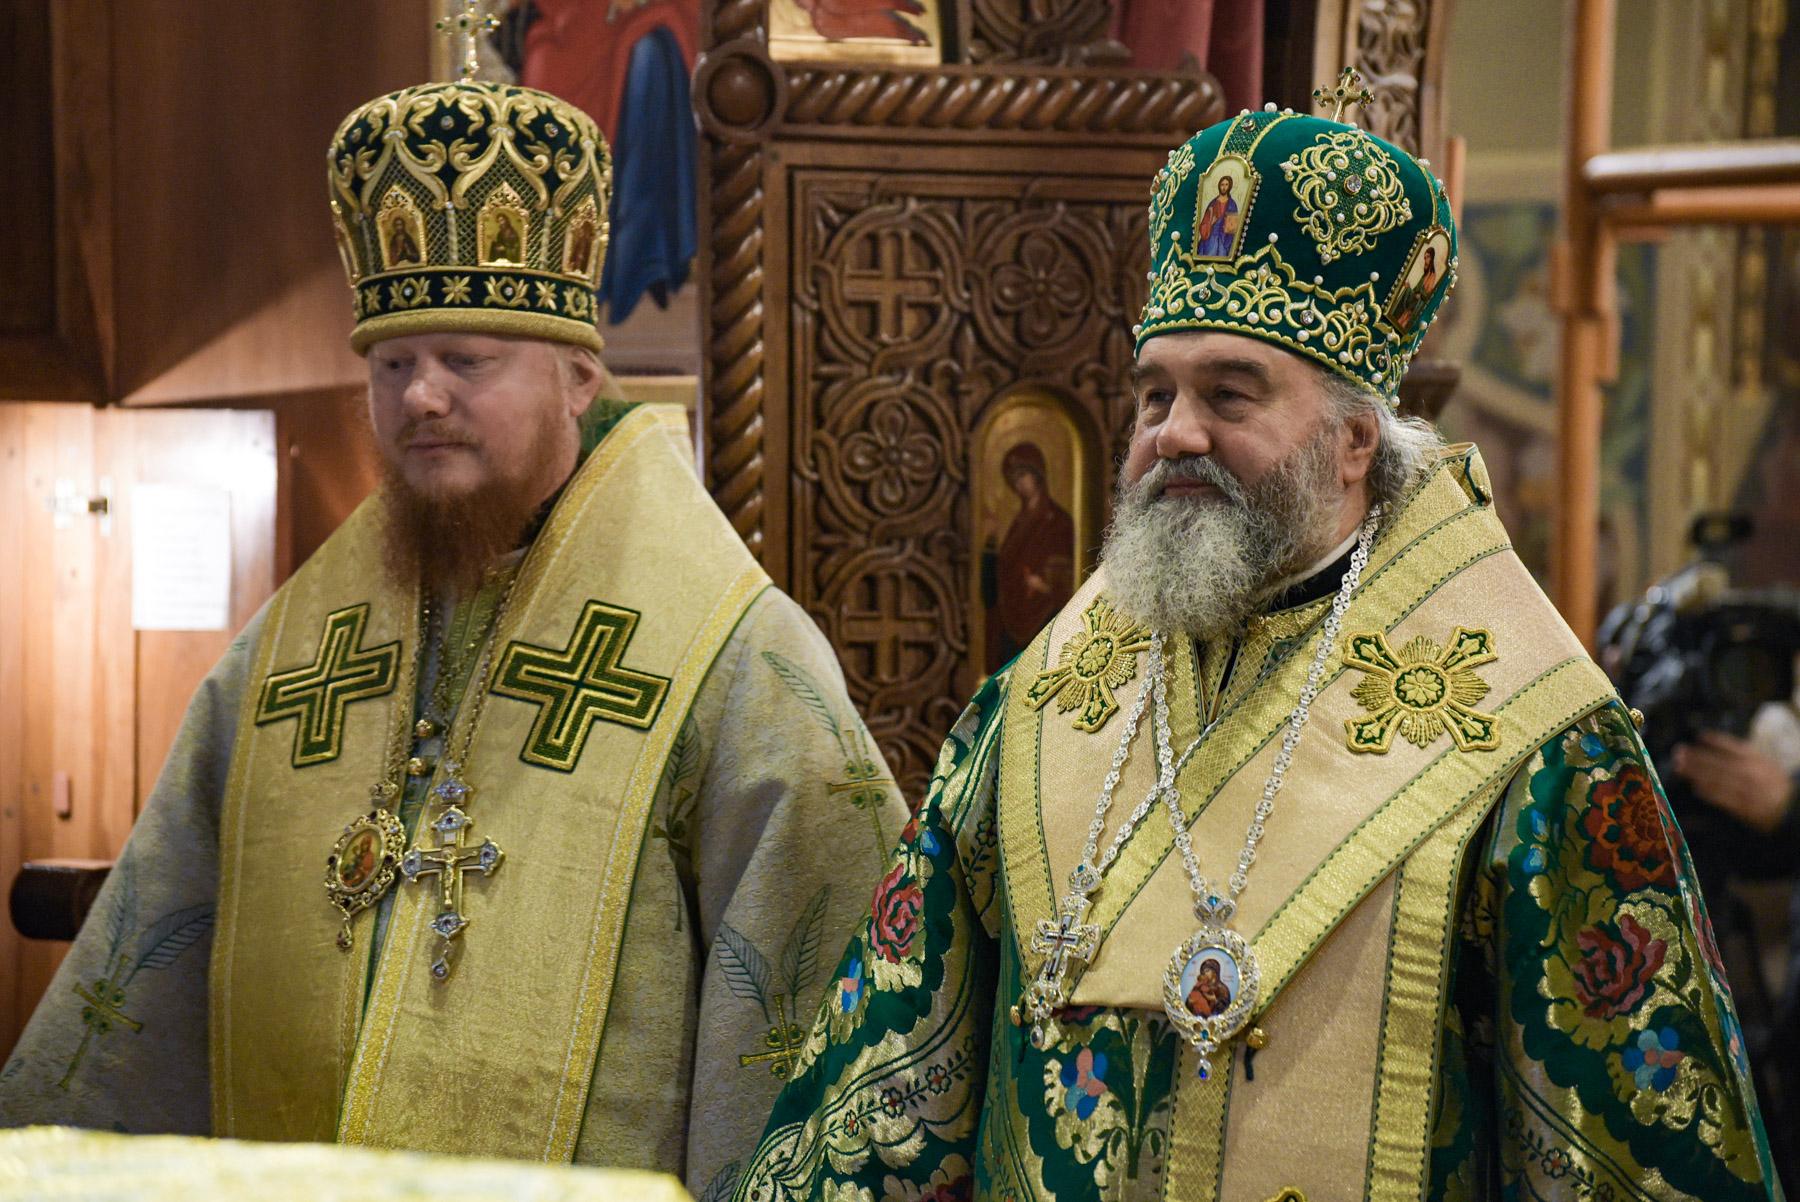 photos of orthodox christmas 0112 2